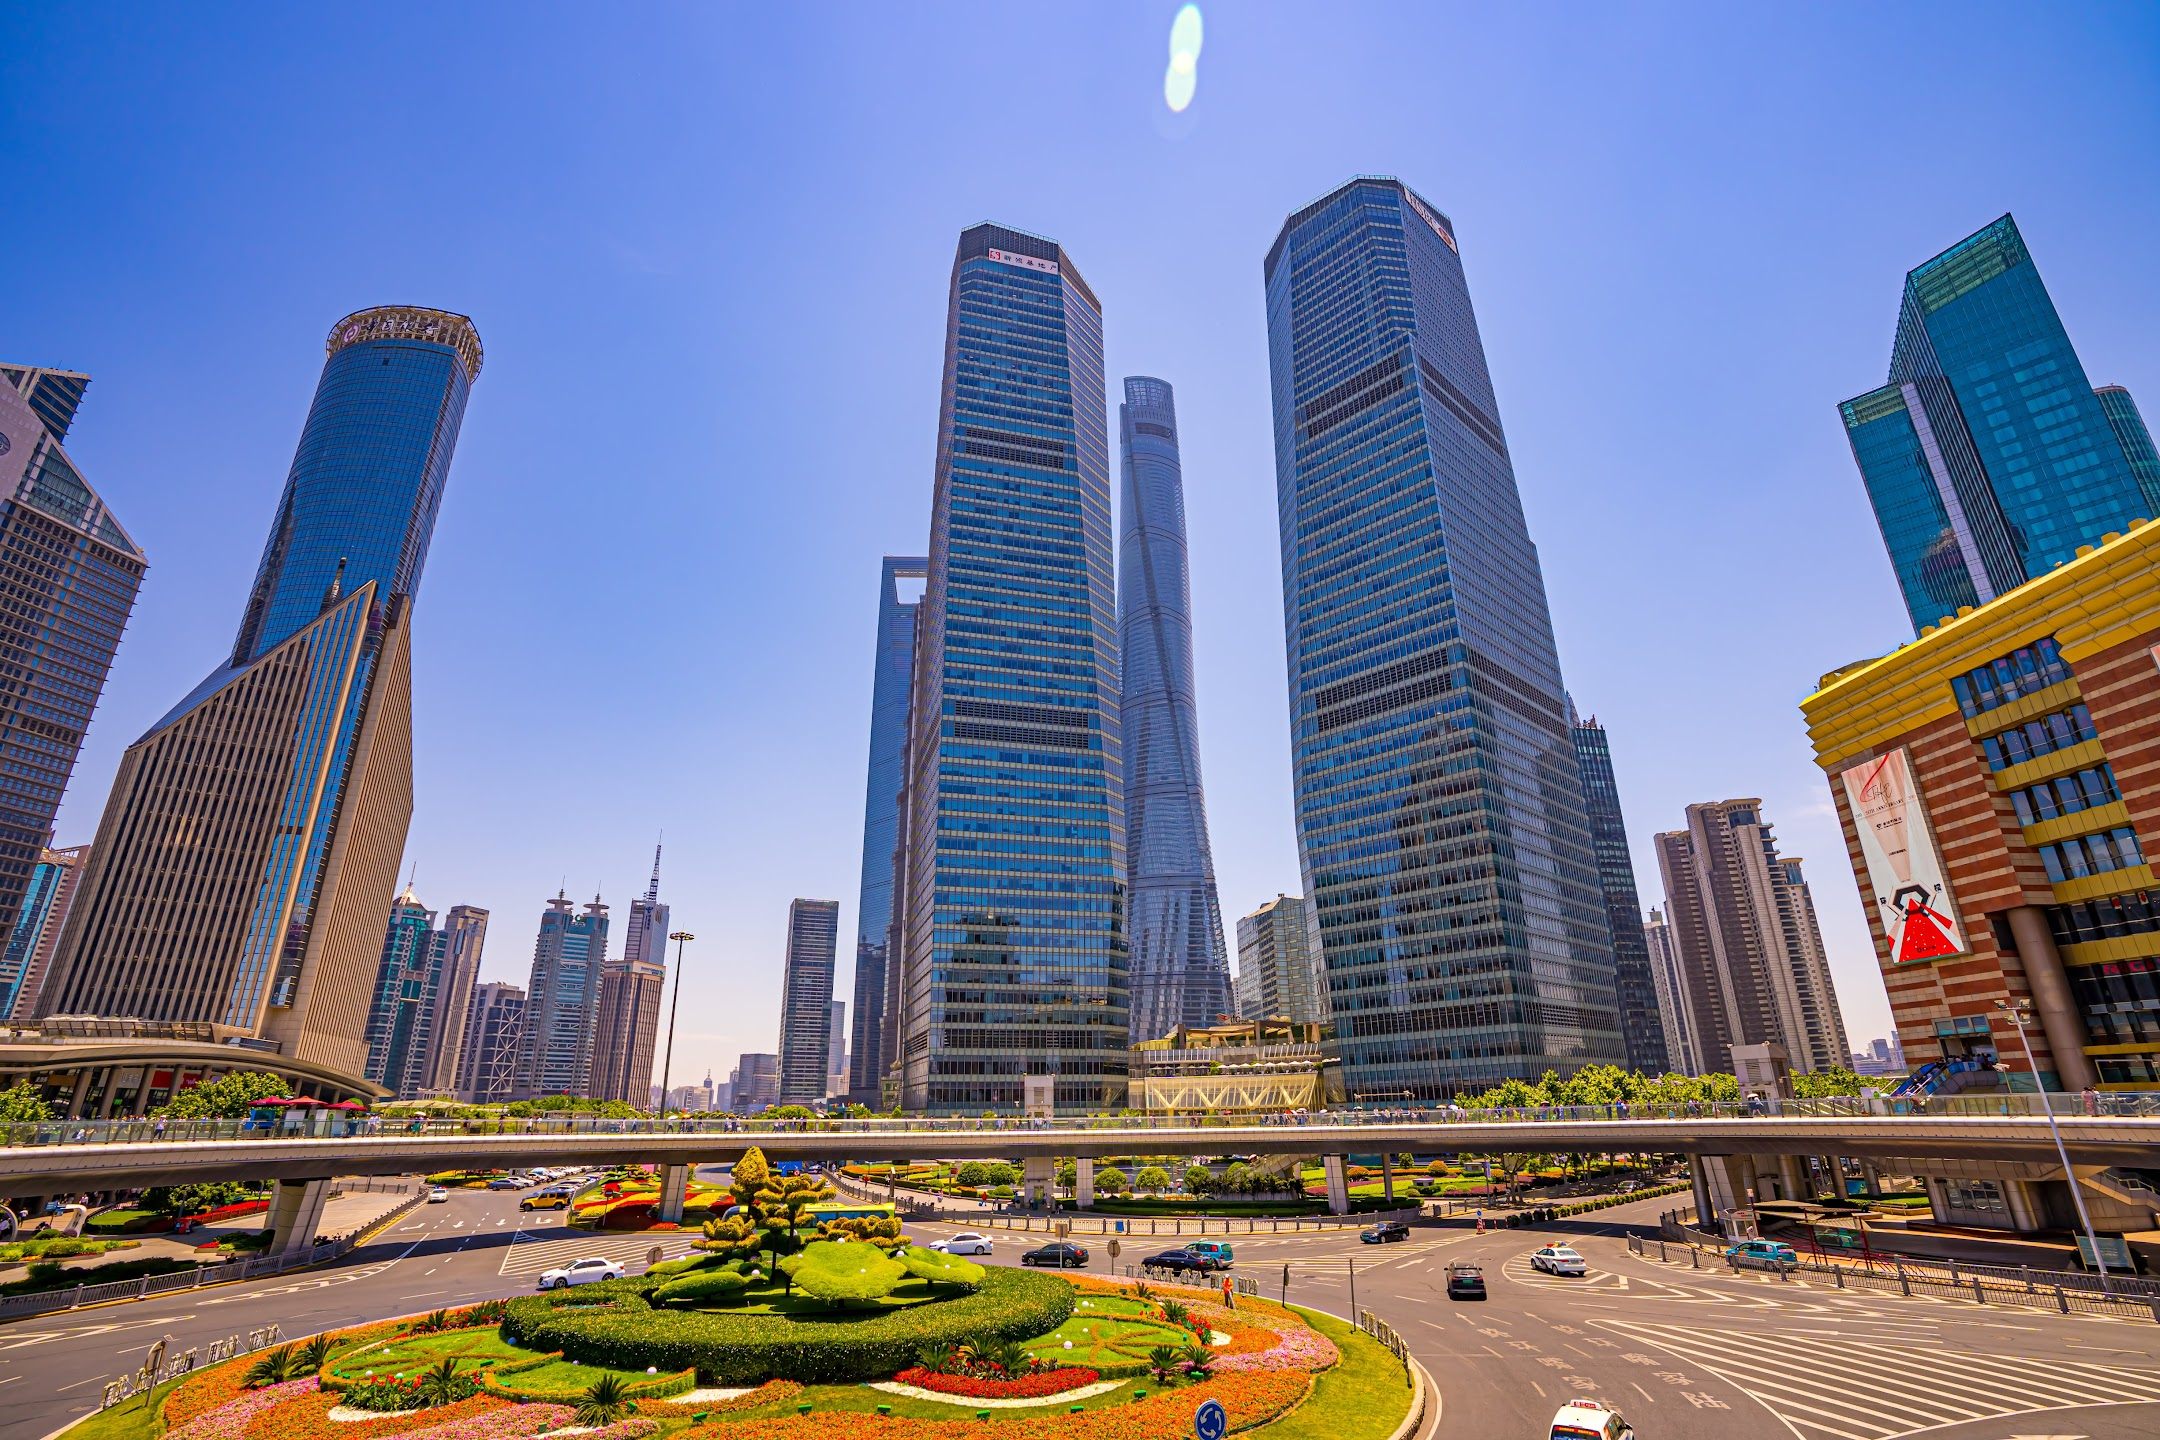 Shanghai Lujiazui Circle overpass1